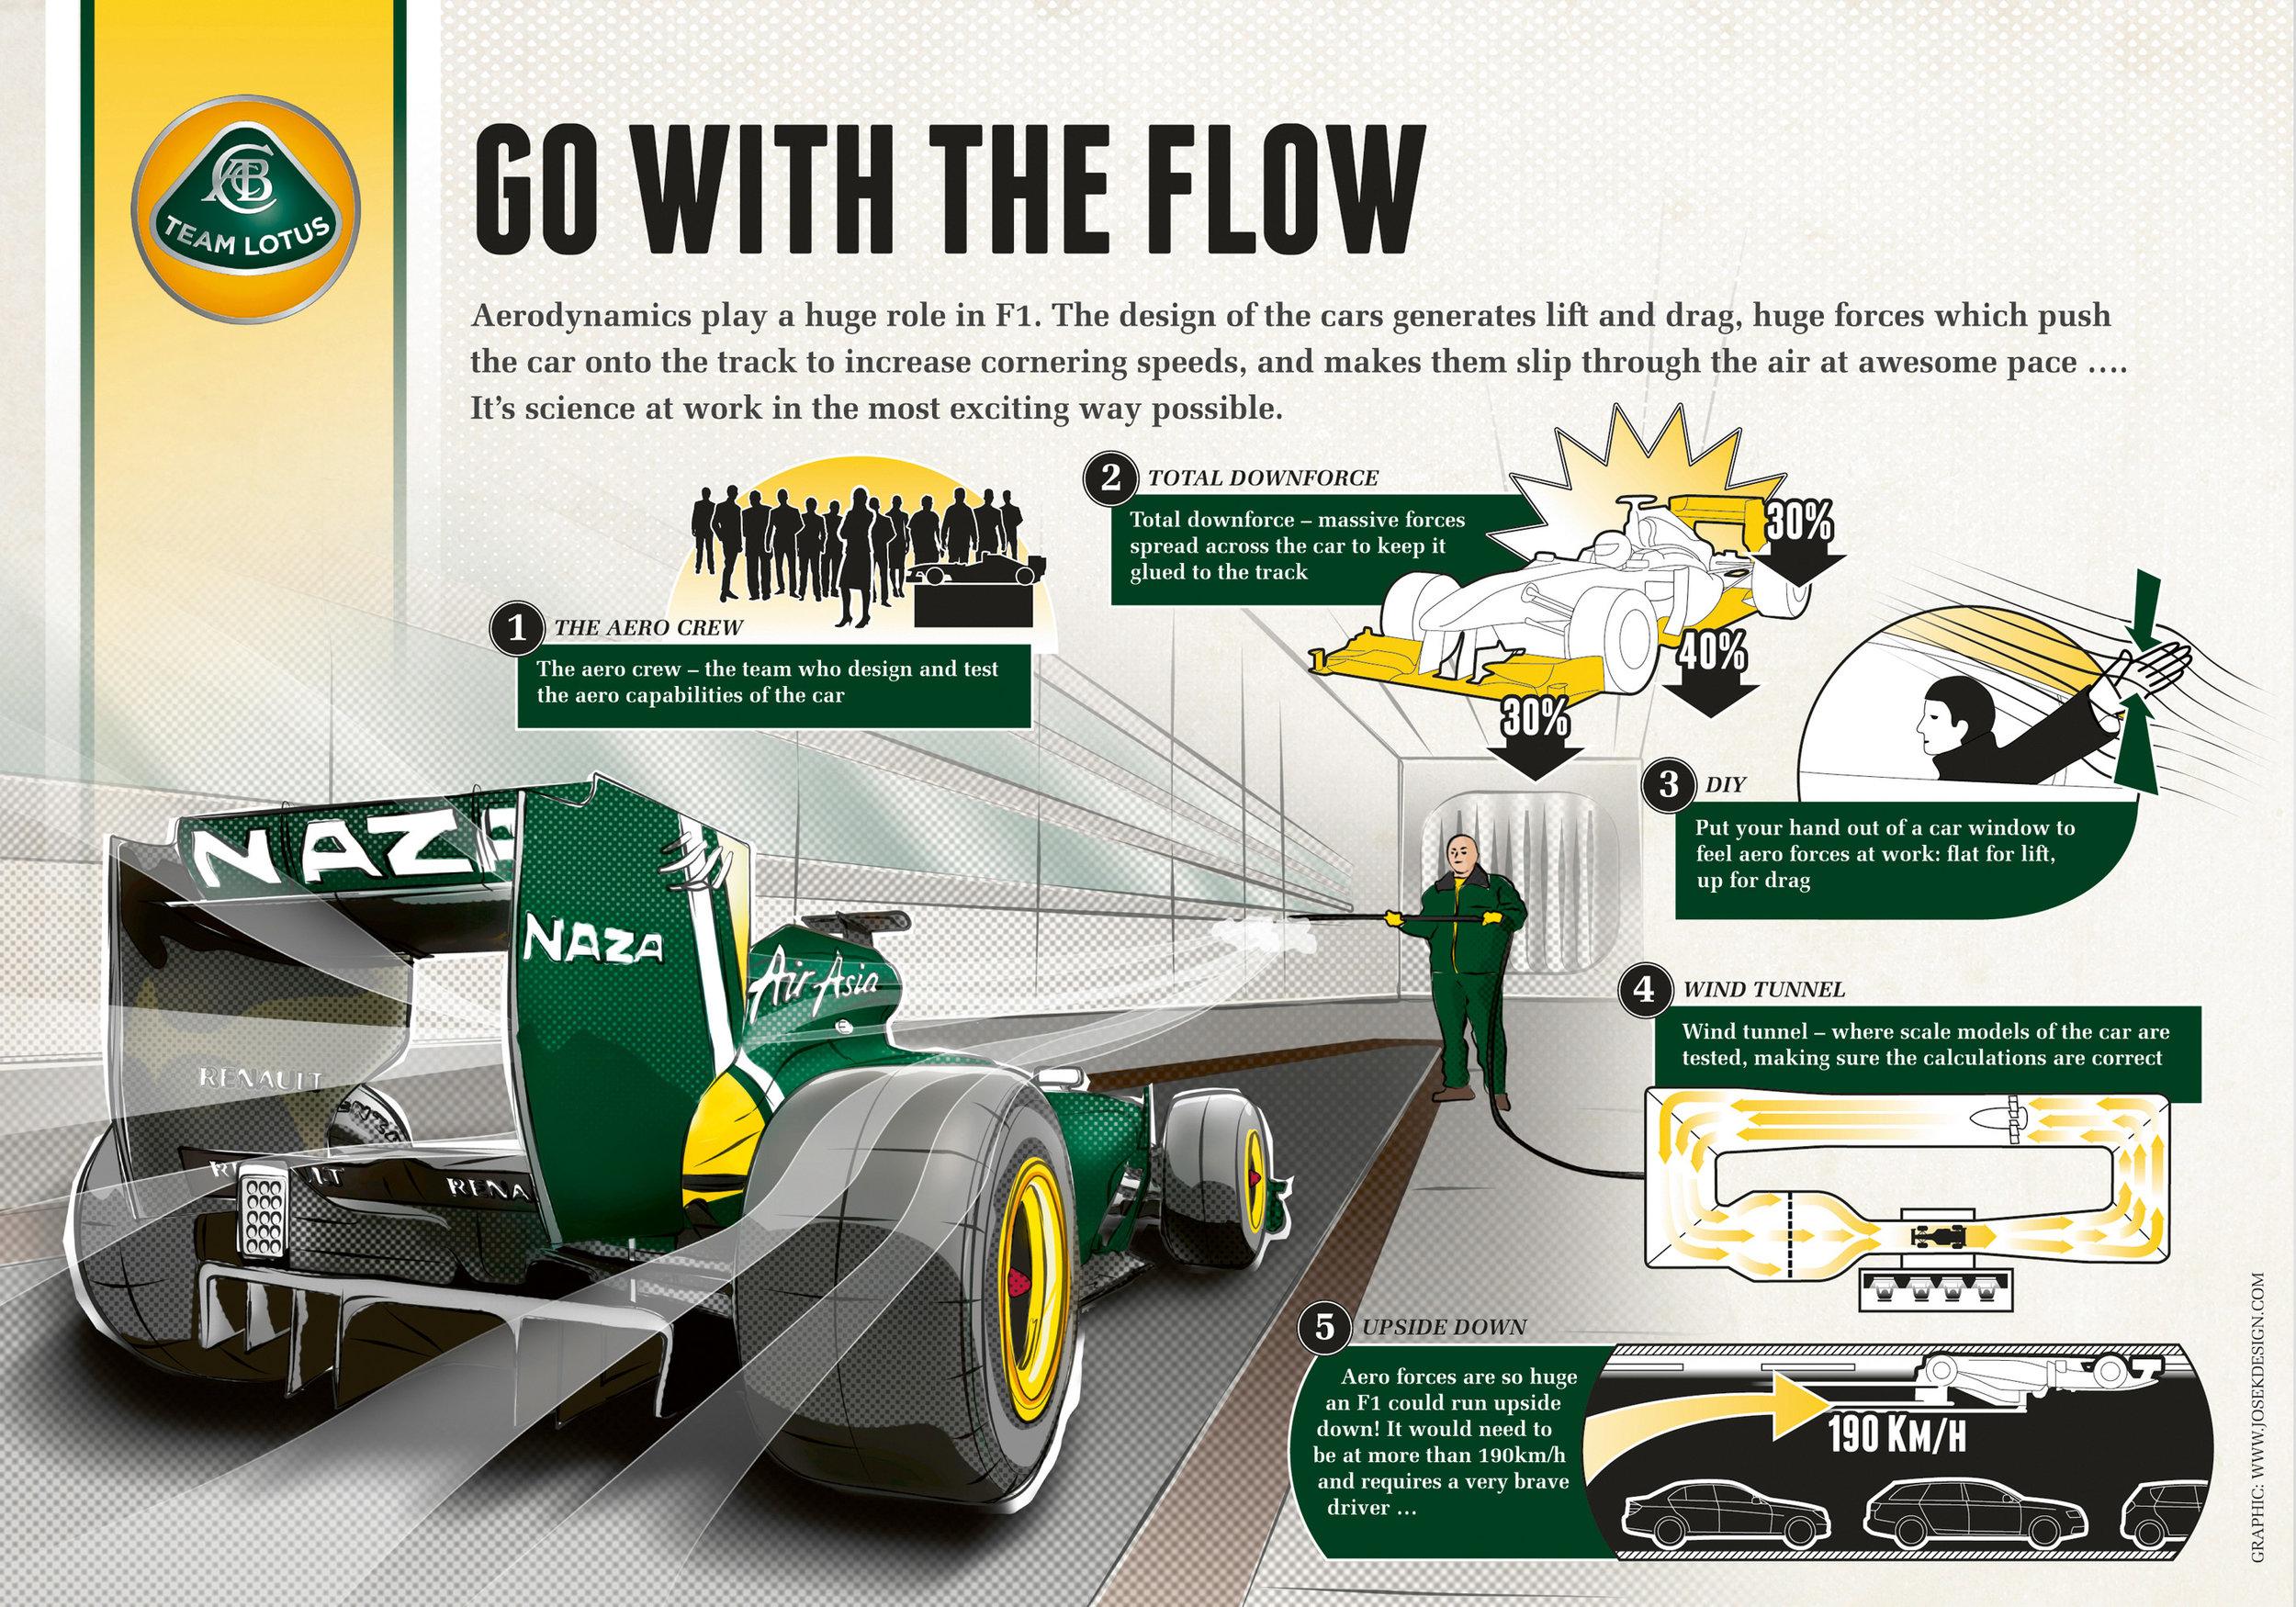 07_Josekdesign_Team_Lotus.jpg